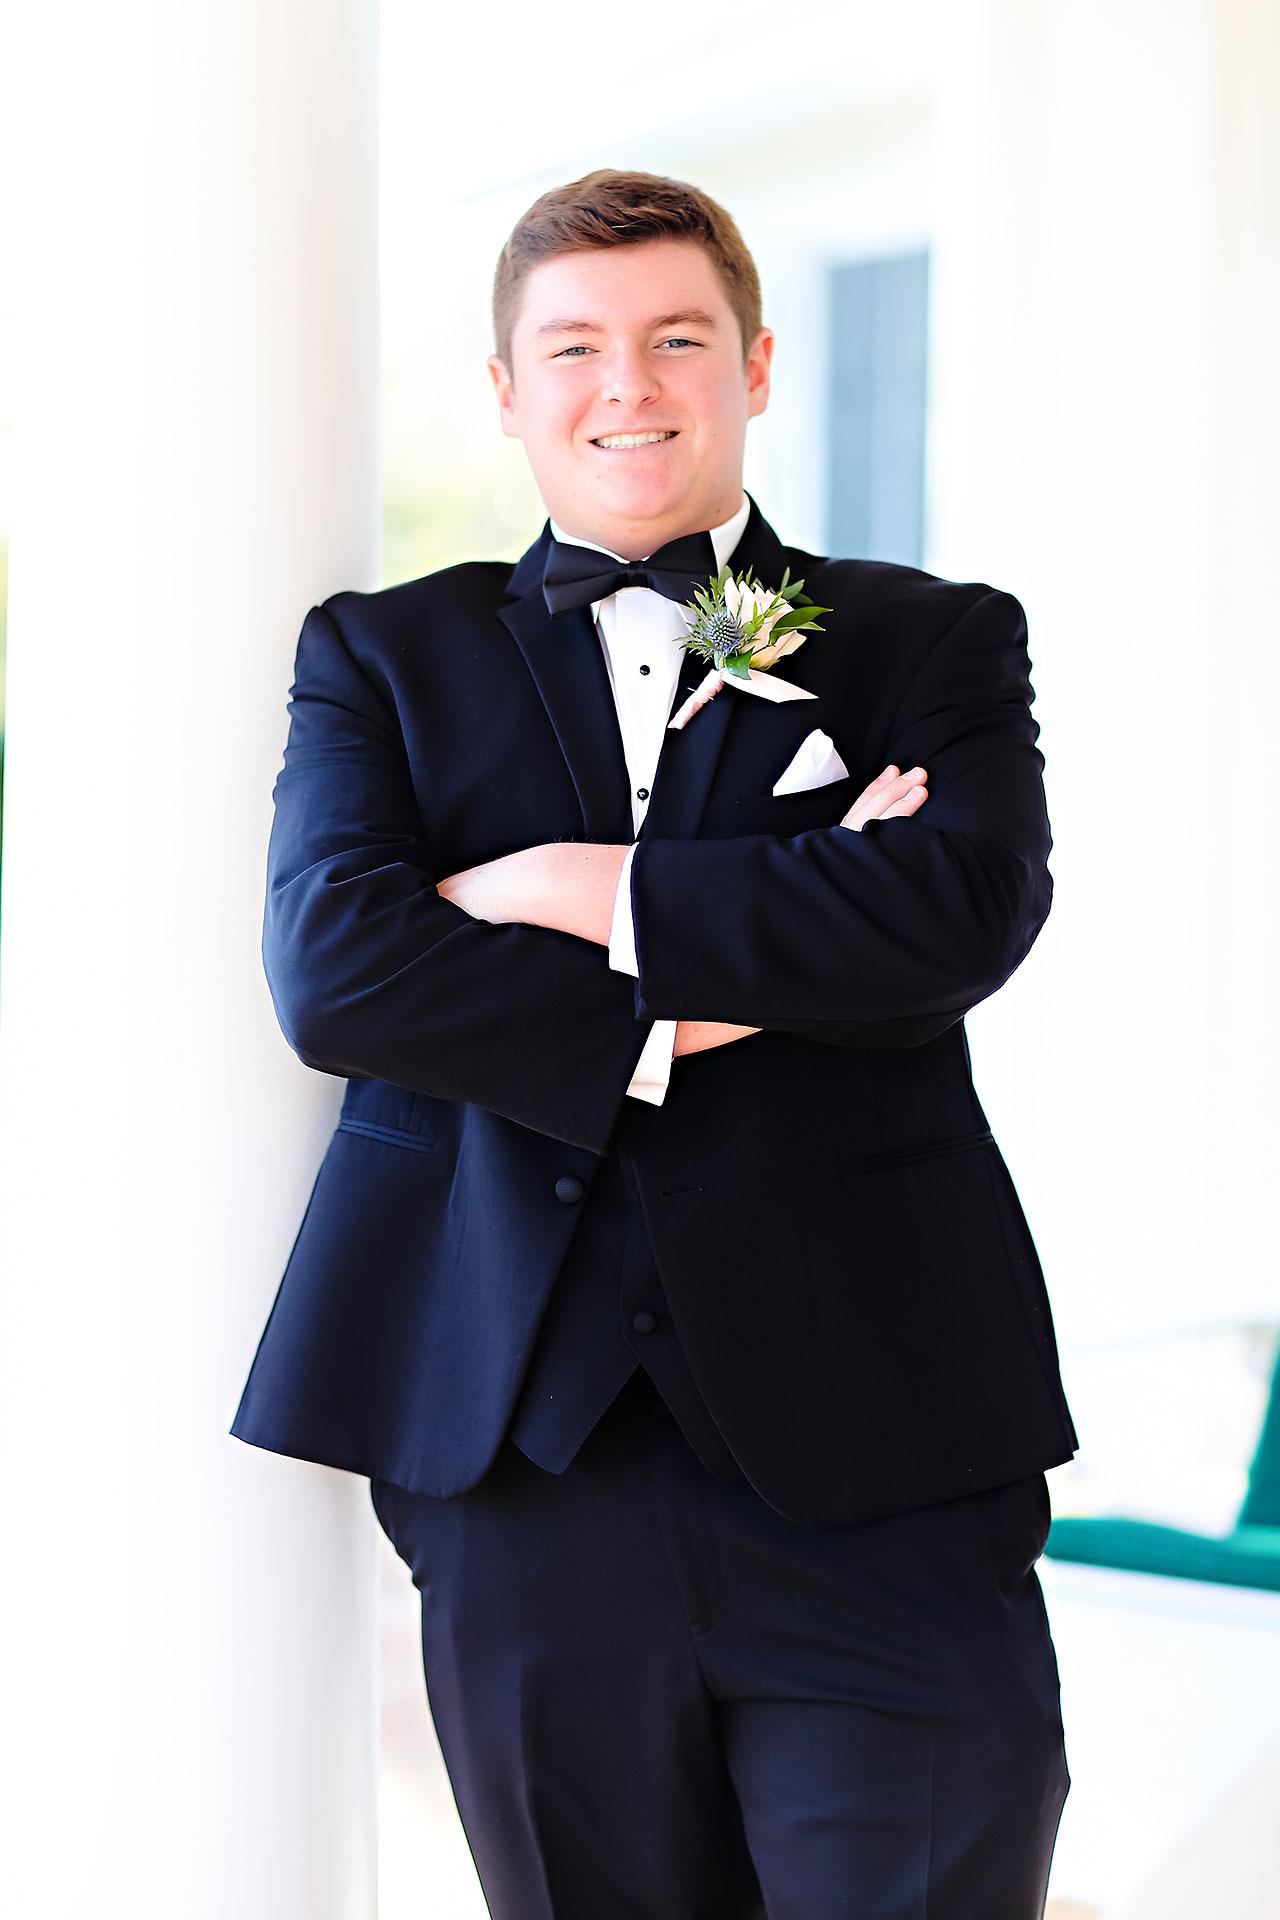 Ashley Steve Bloomington Indiana Wedding 160